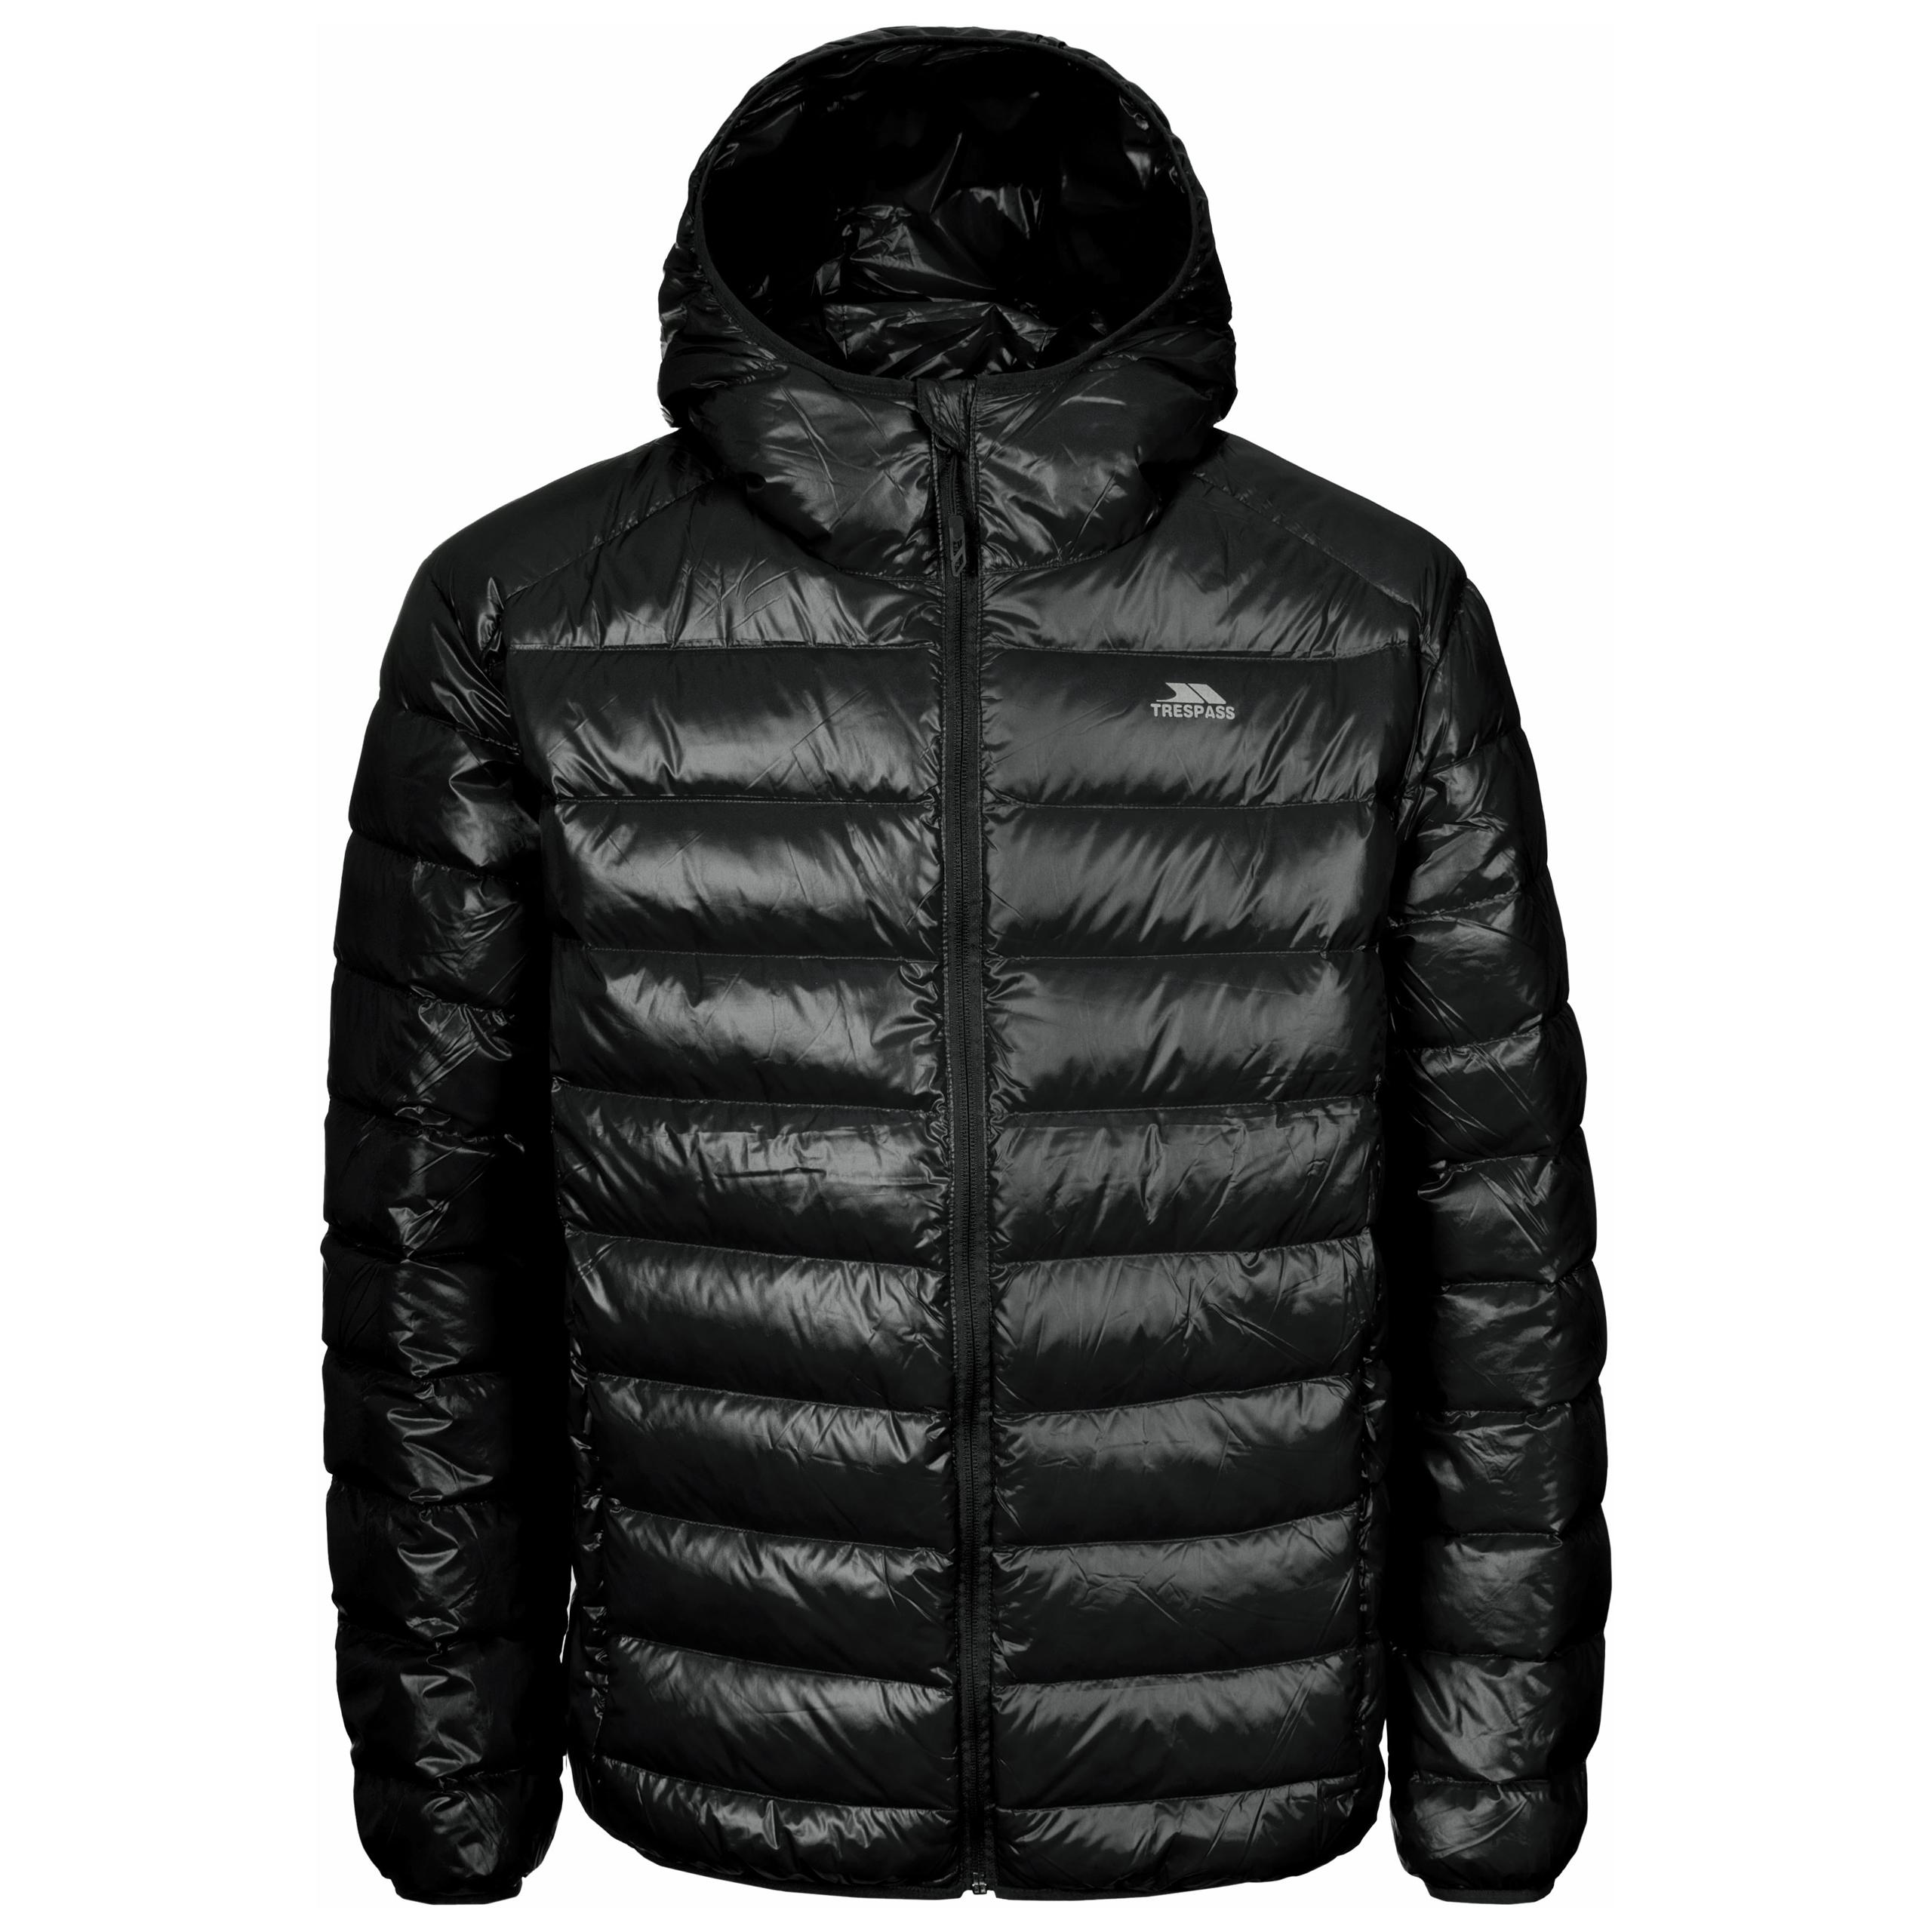 Trespass RAMIREZ Mens Hooded Winter Down Jacket Warm Padded Coat ...